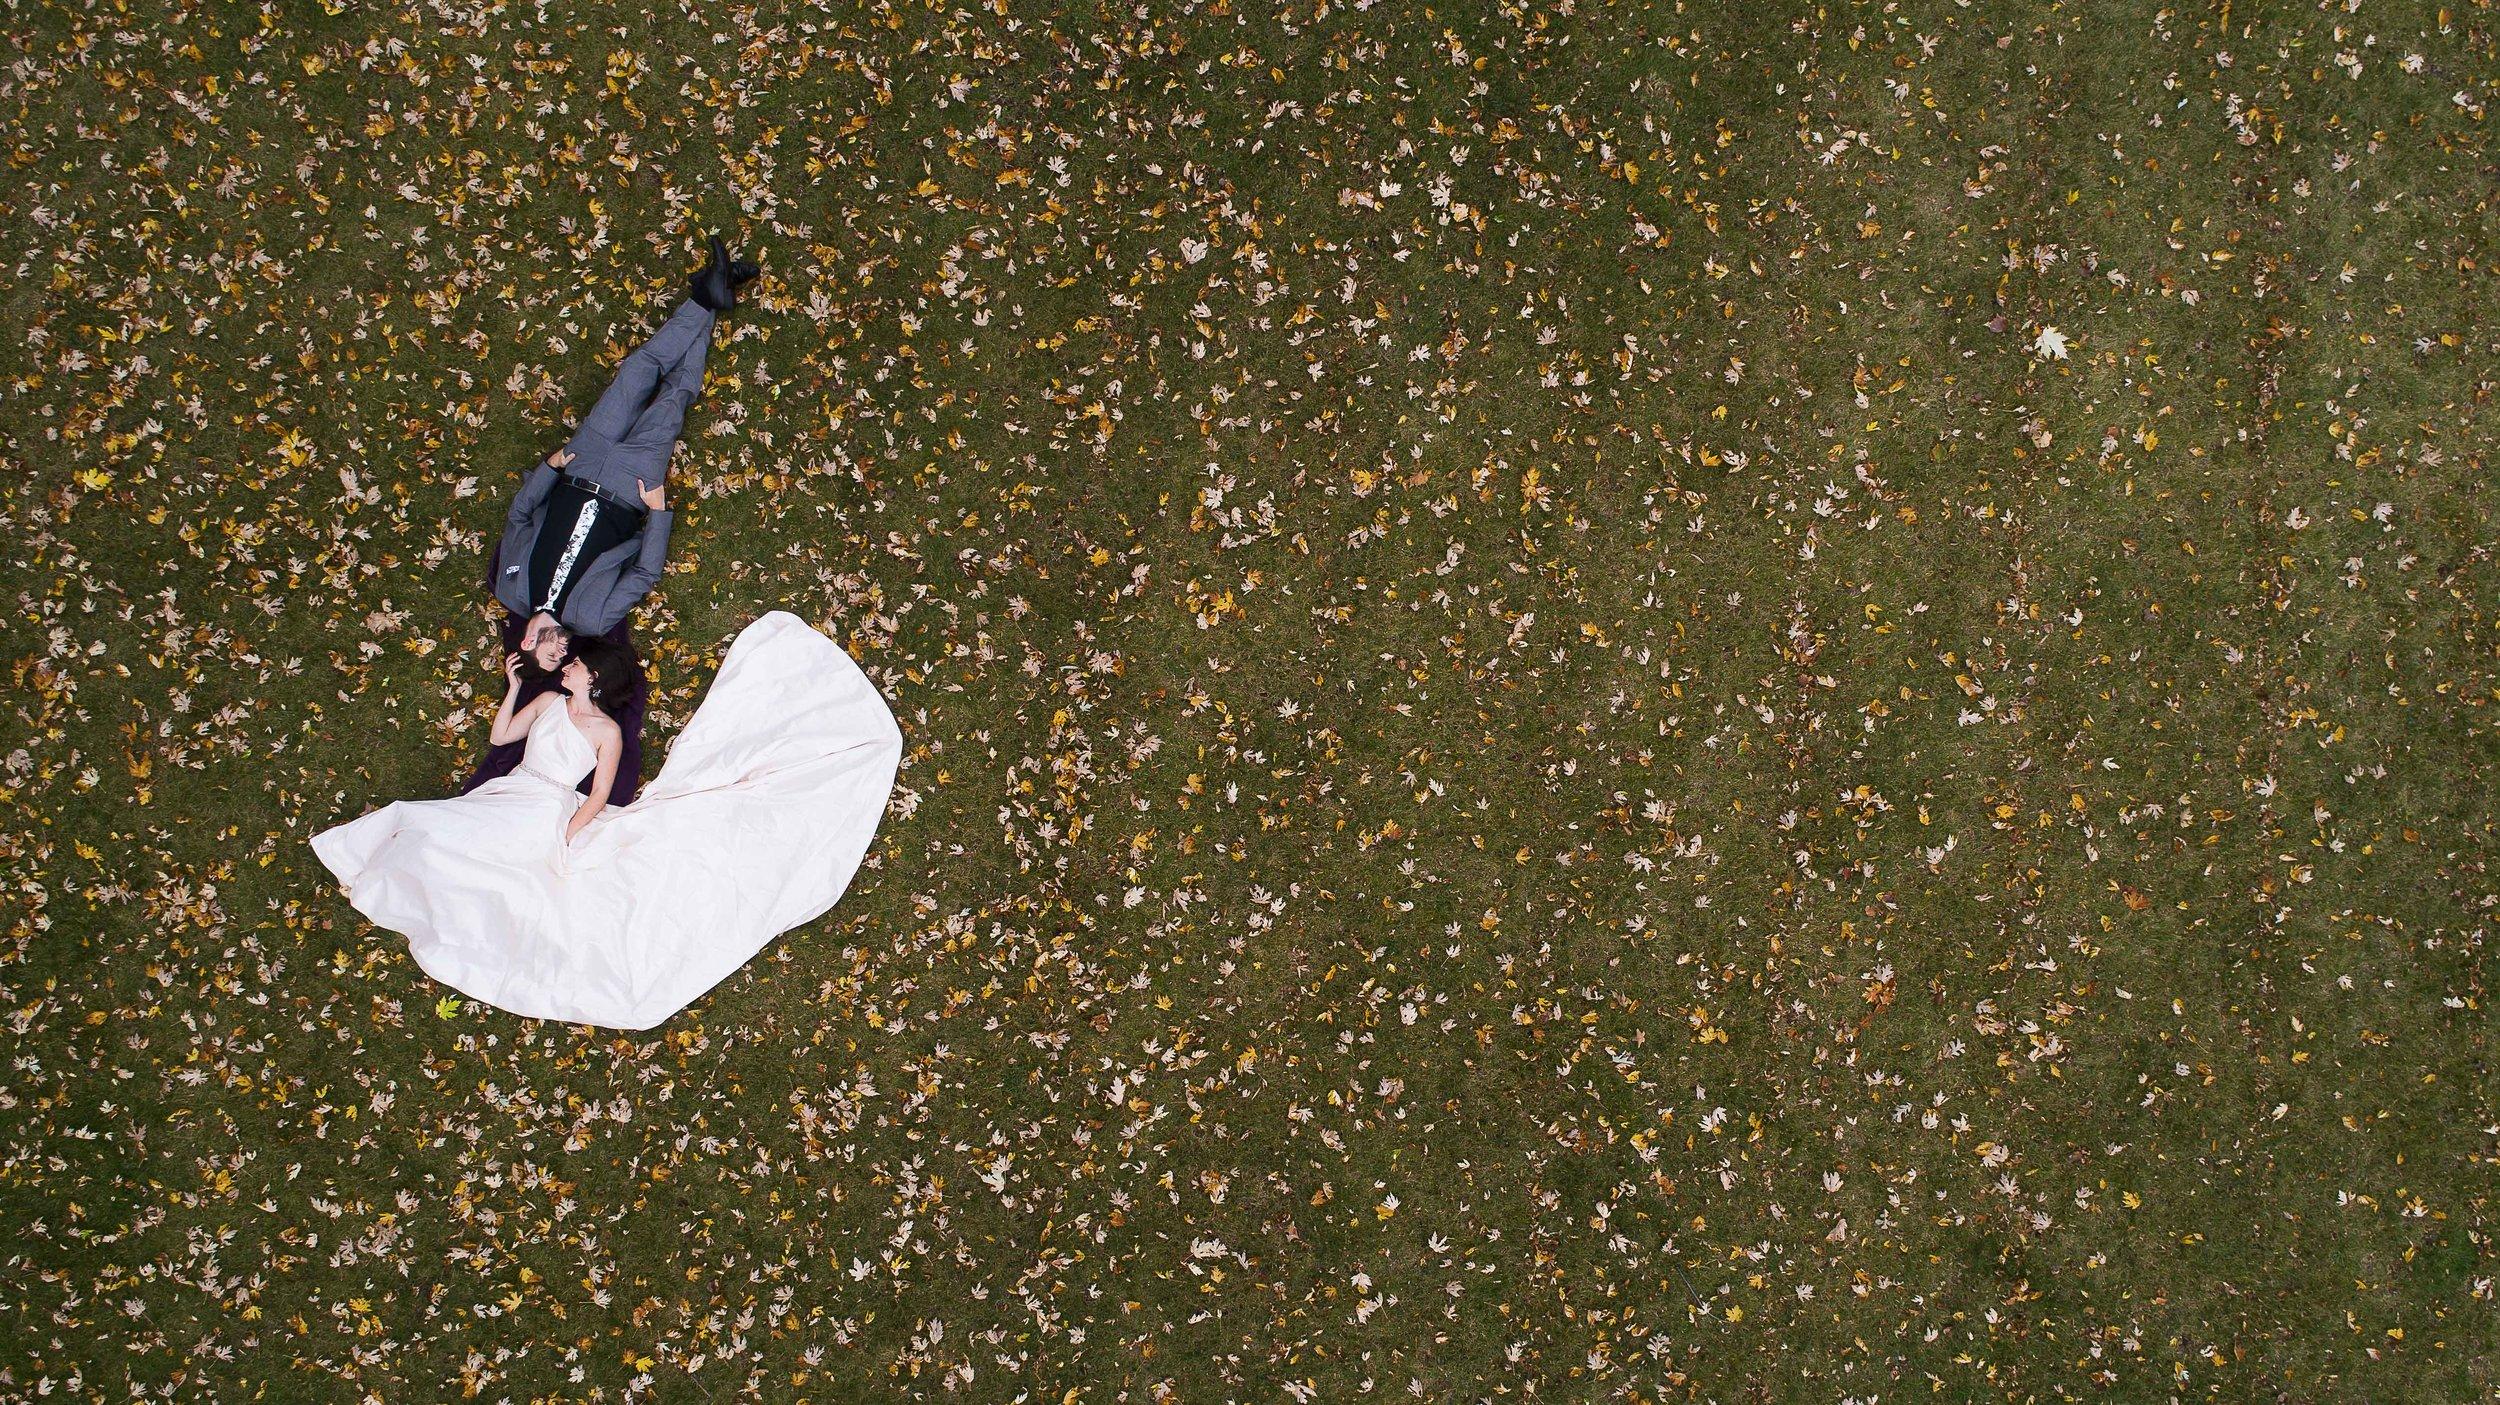 Drone photos-7.jpg